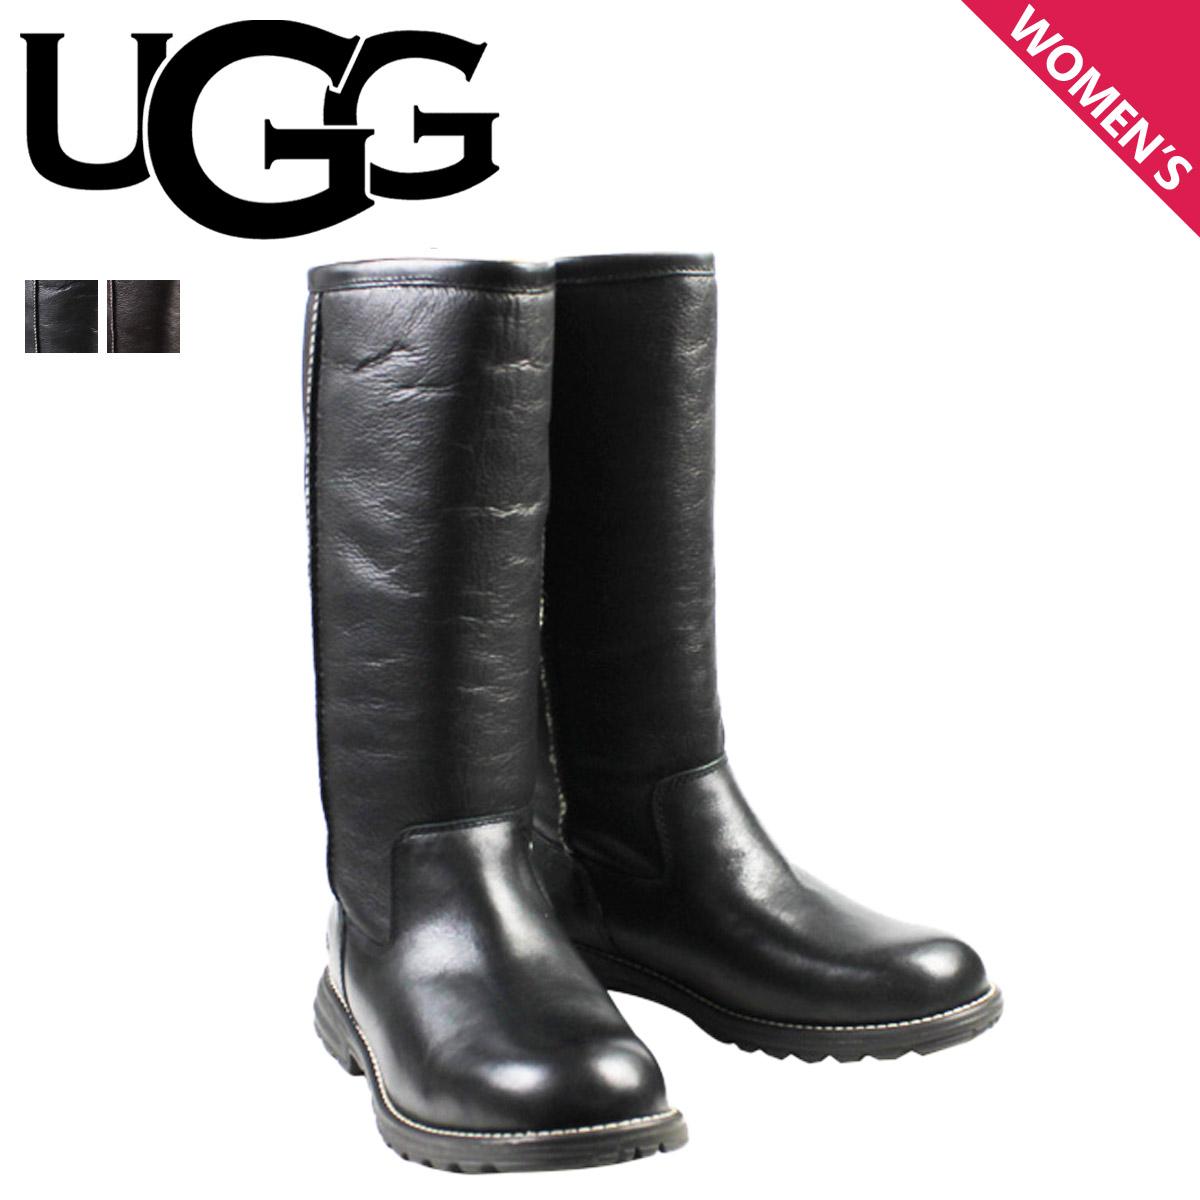 ugg tall black boots womens